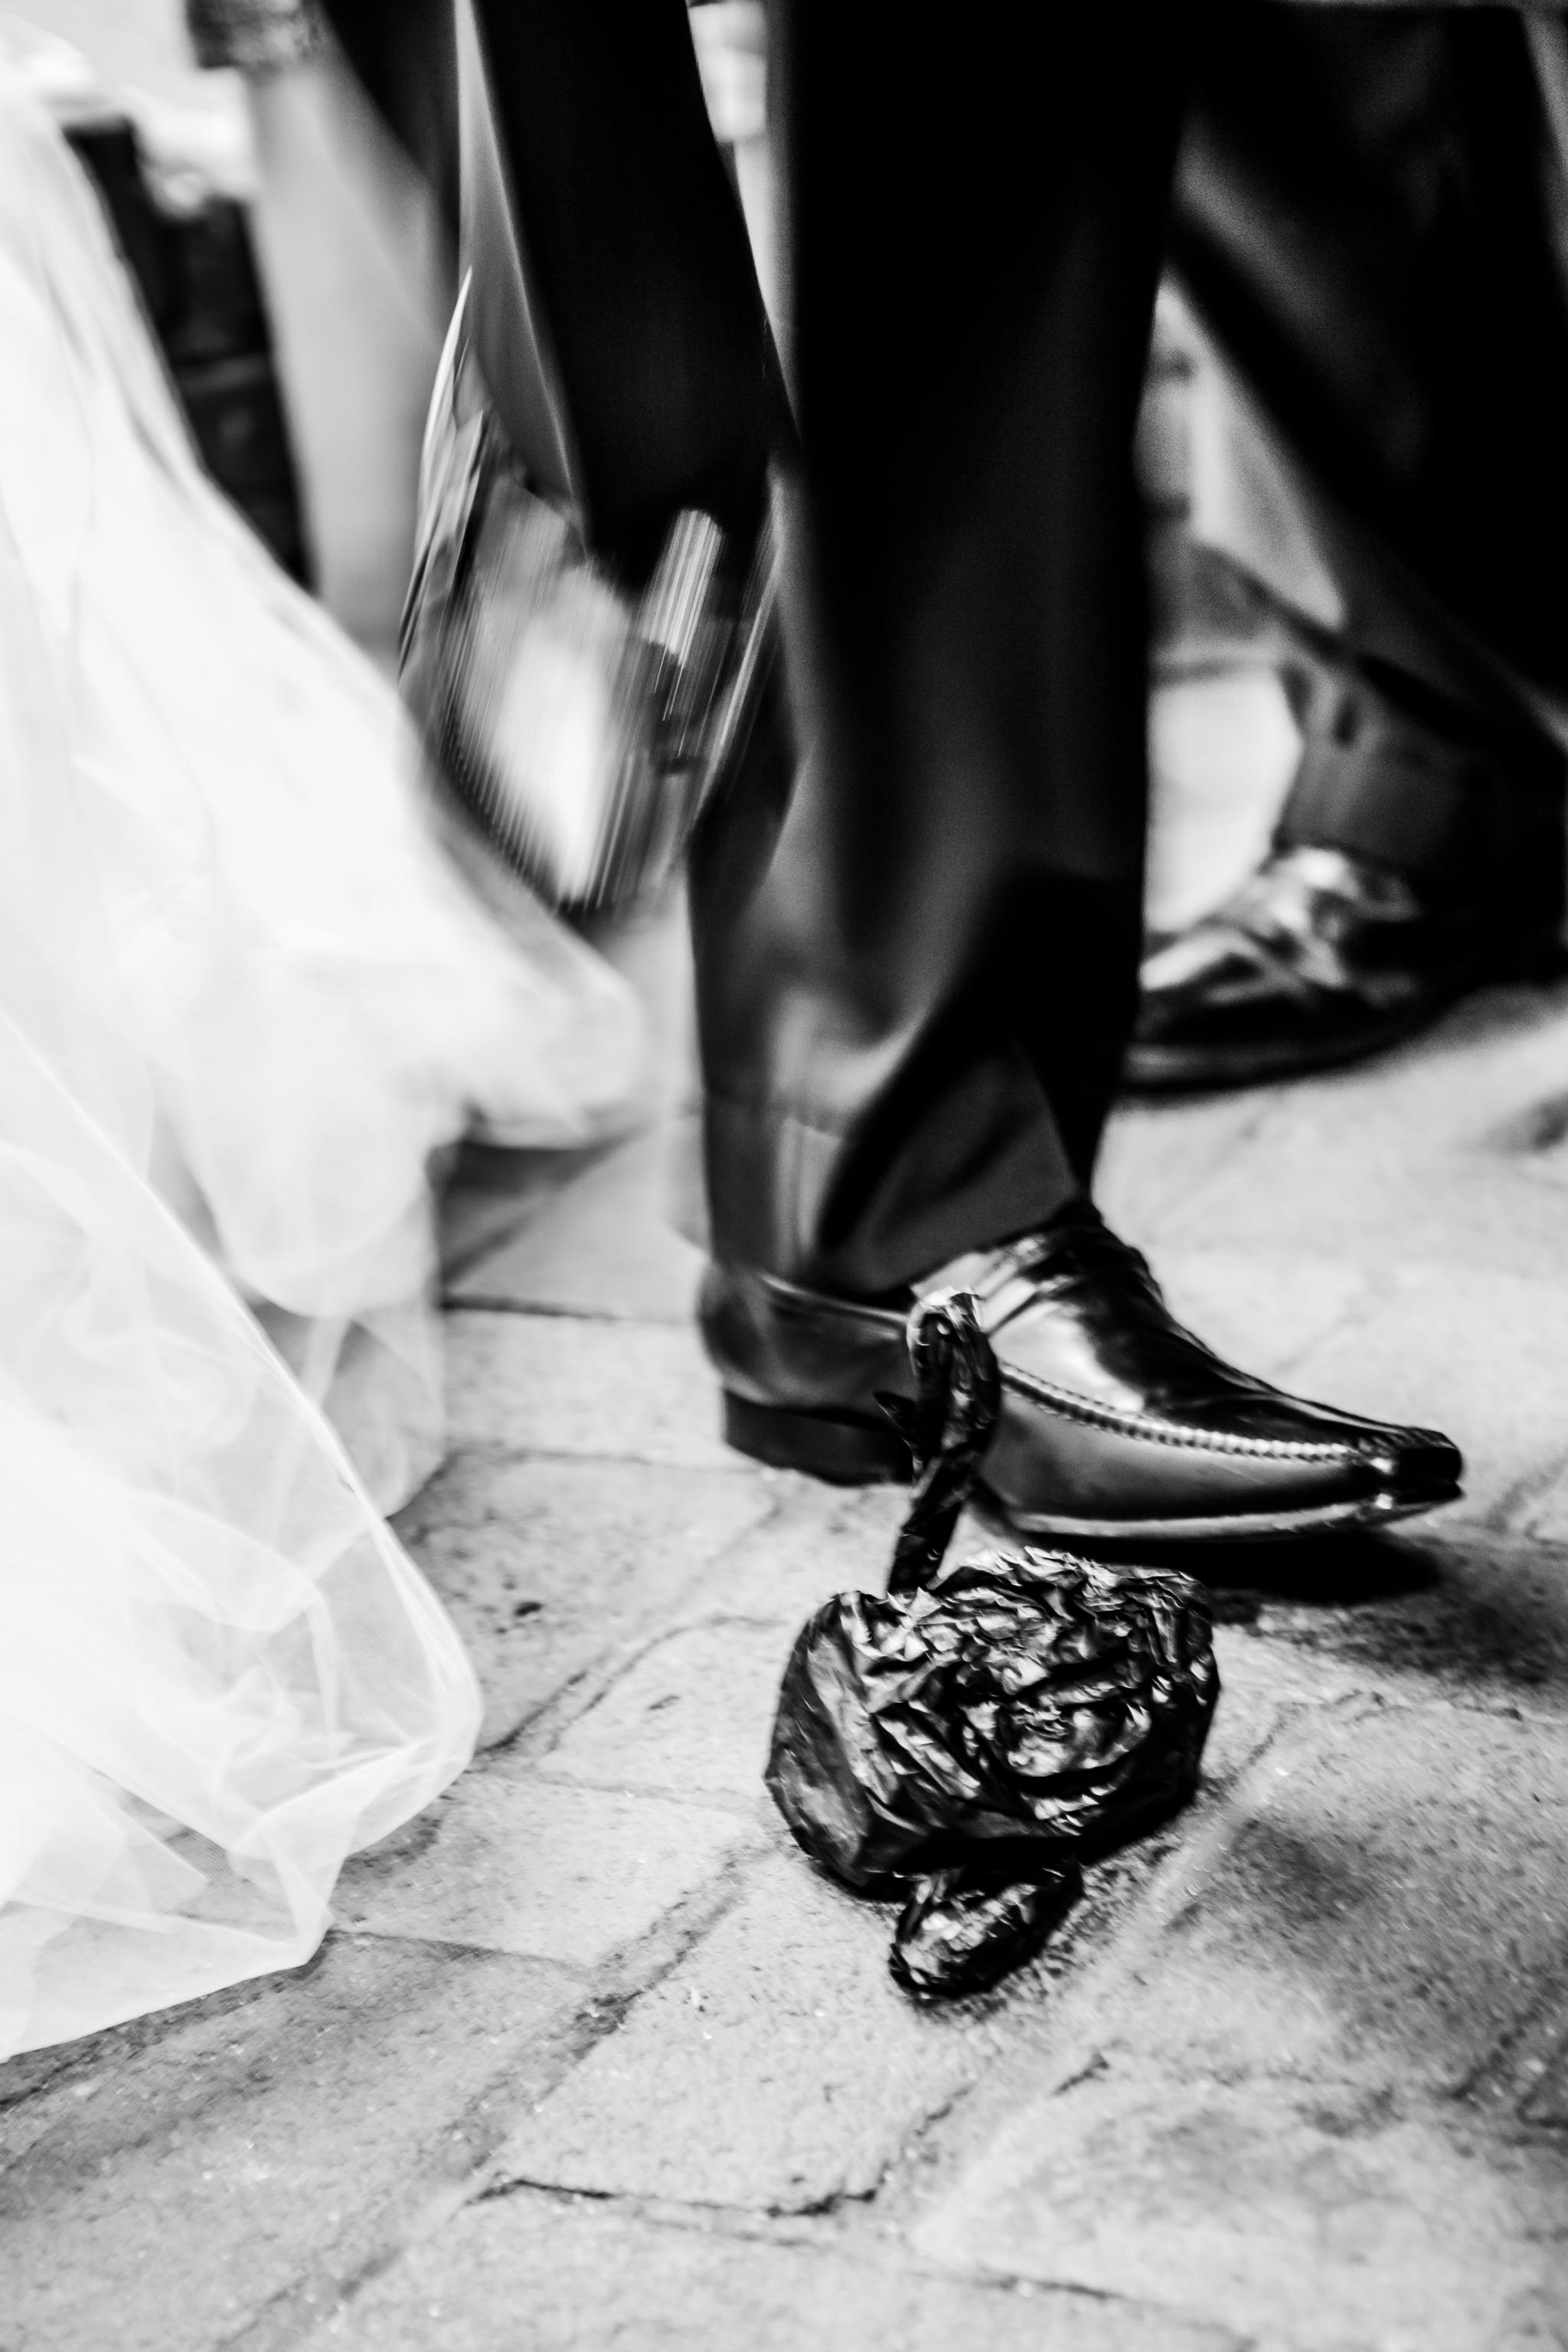 Wedding Iossi and Gitty Khafif  - Eliau Piha studio photography, new york, events, people 770 brooklyn -0485.jpg